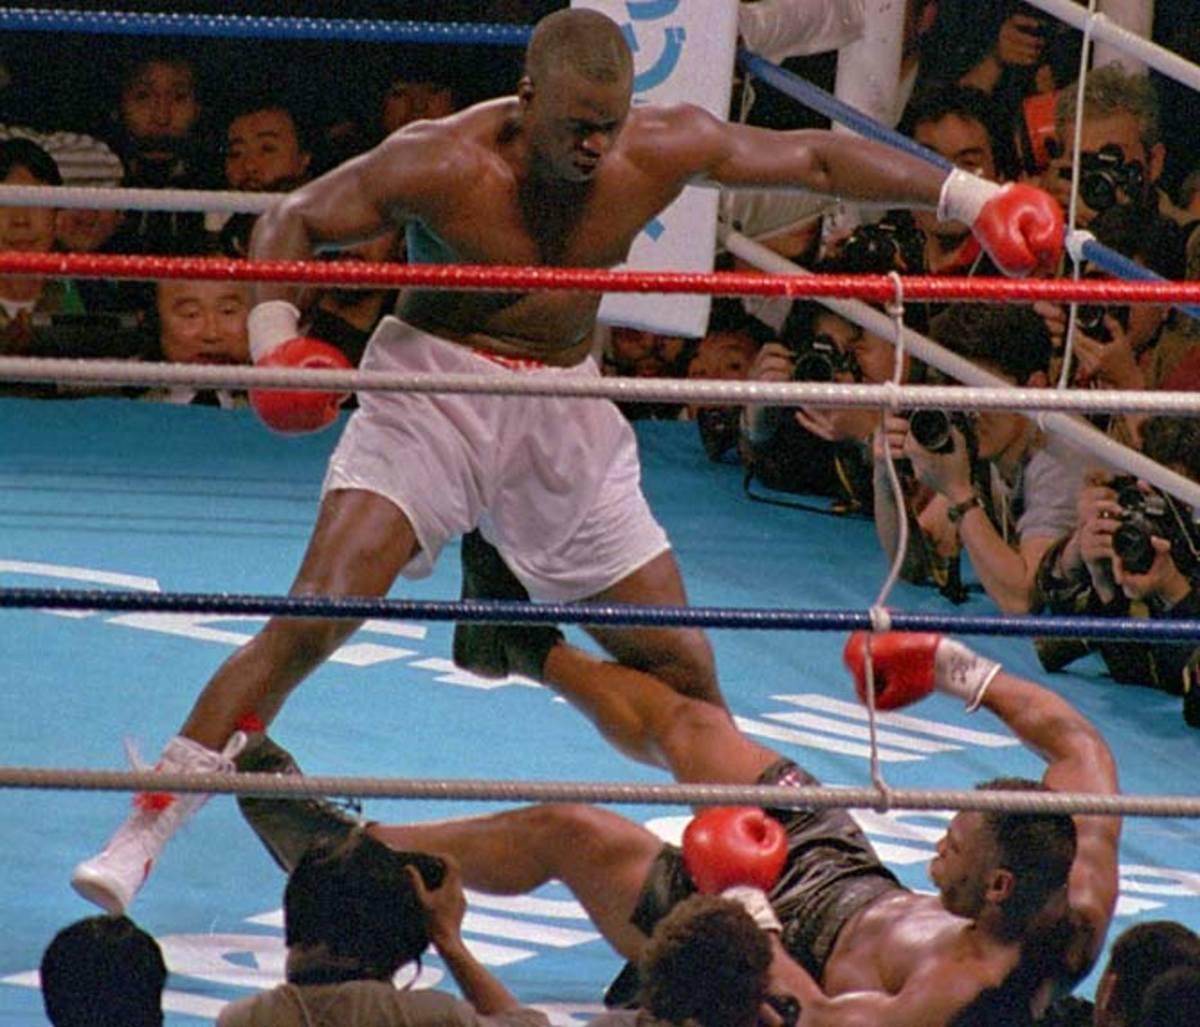 Mike Tyson vs. Buster Douglas, 1990